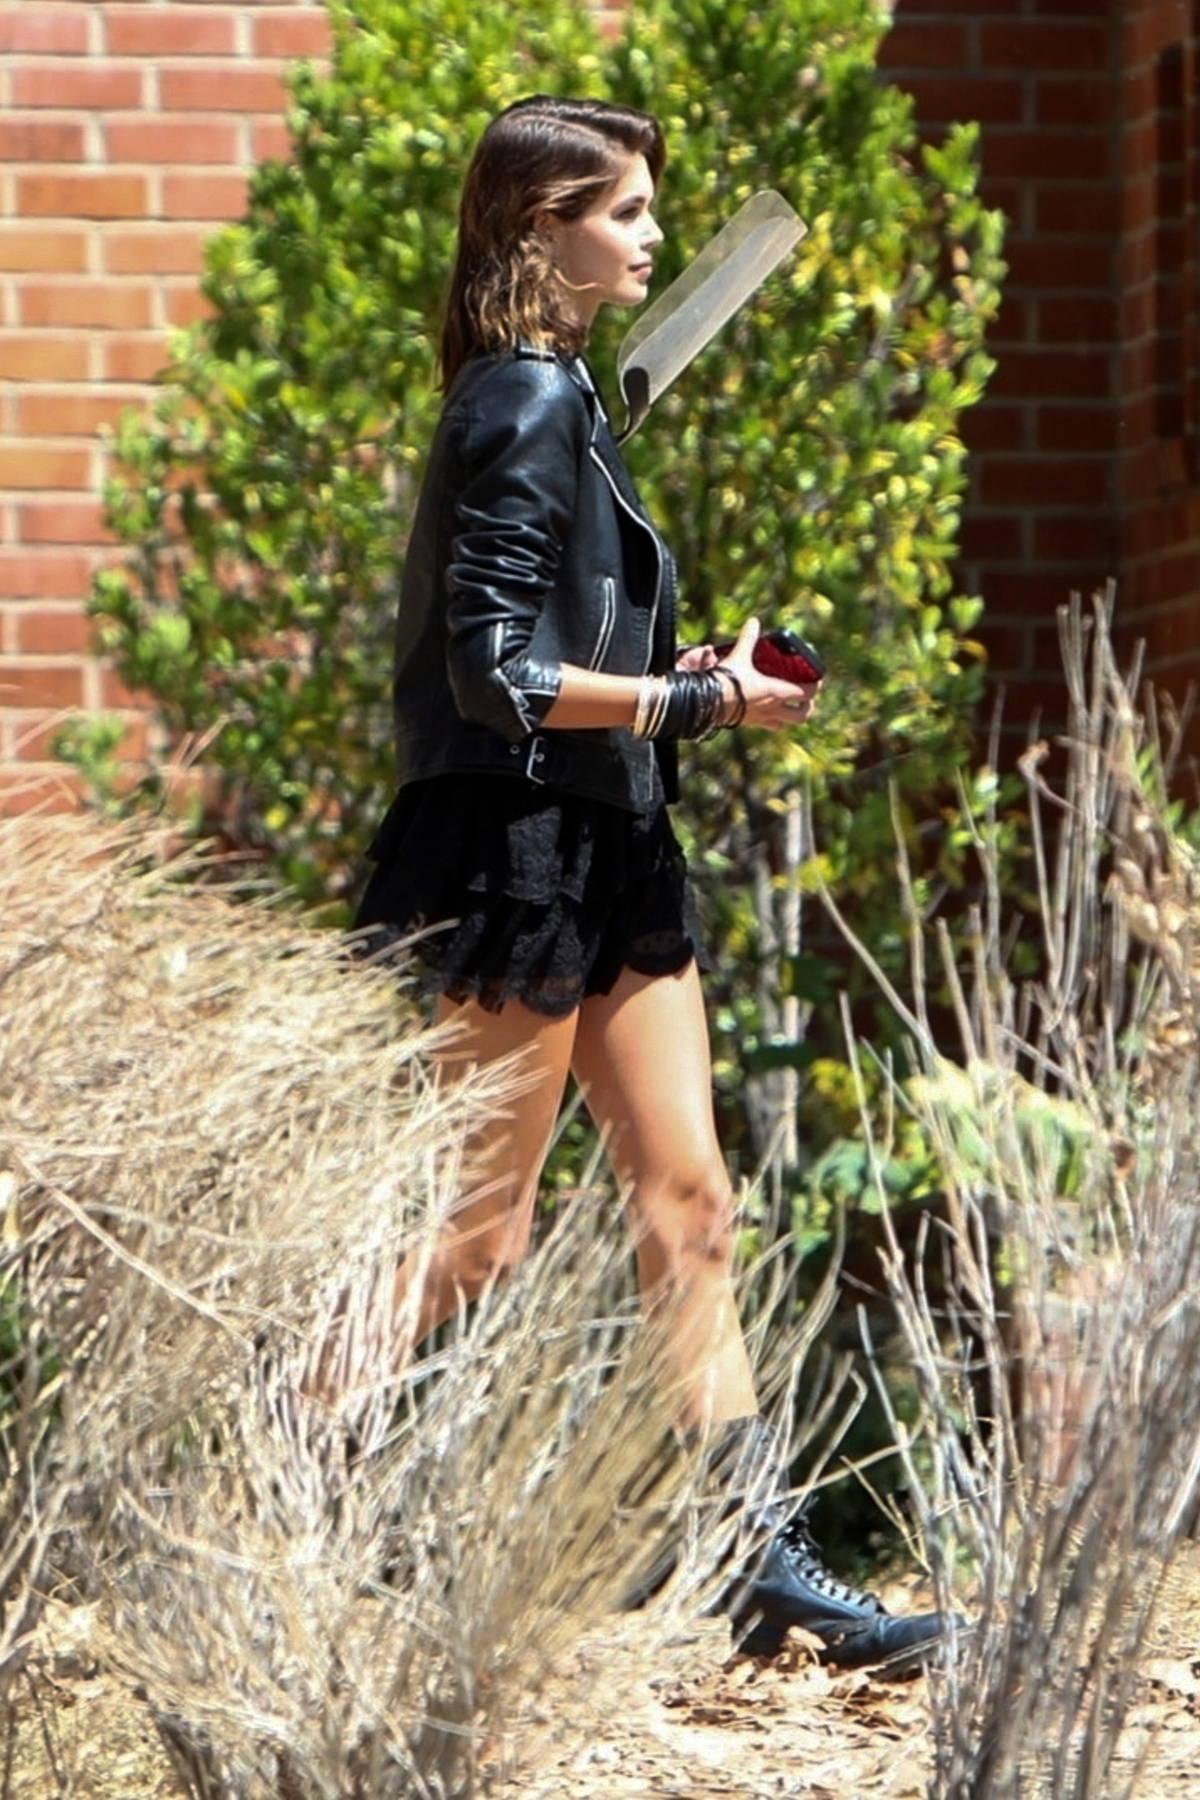 Kaia Gerber seen filming the season finale of 'American Horror Story' in Los Angeles